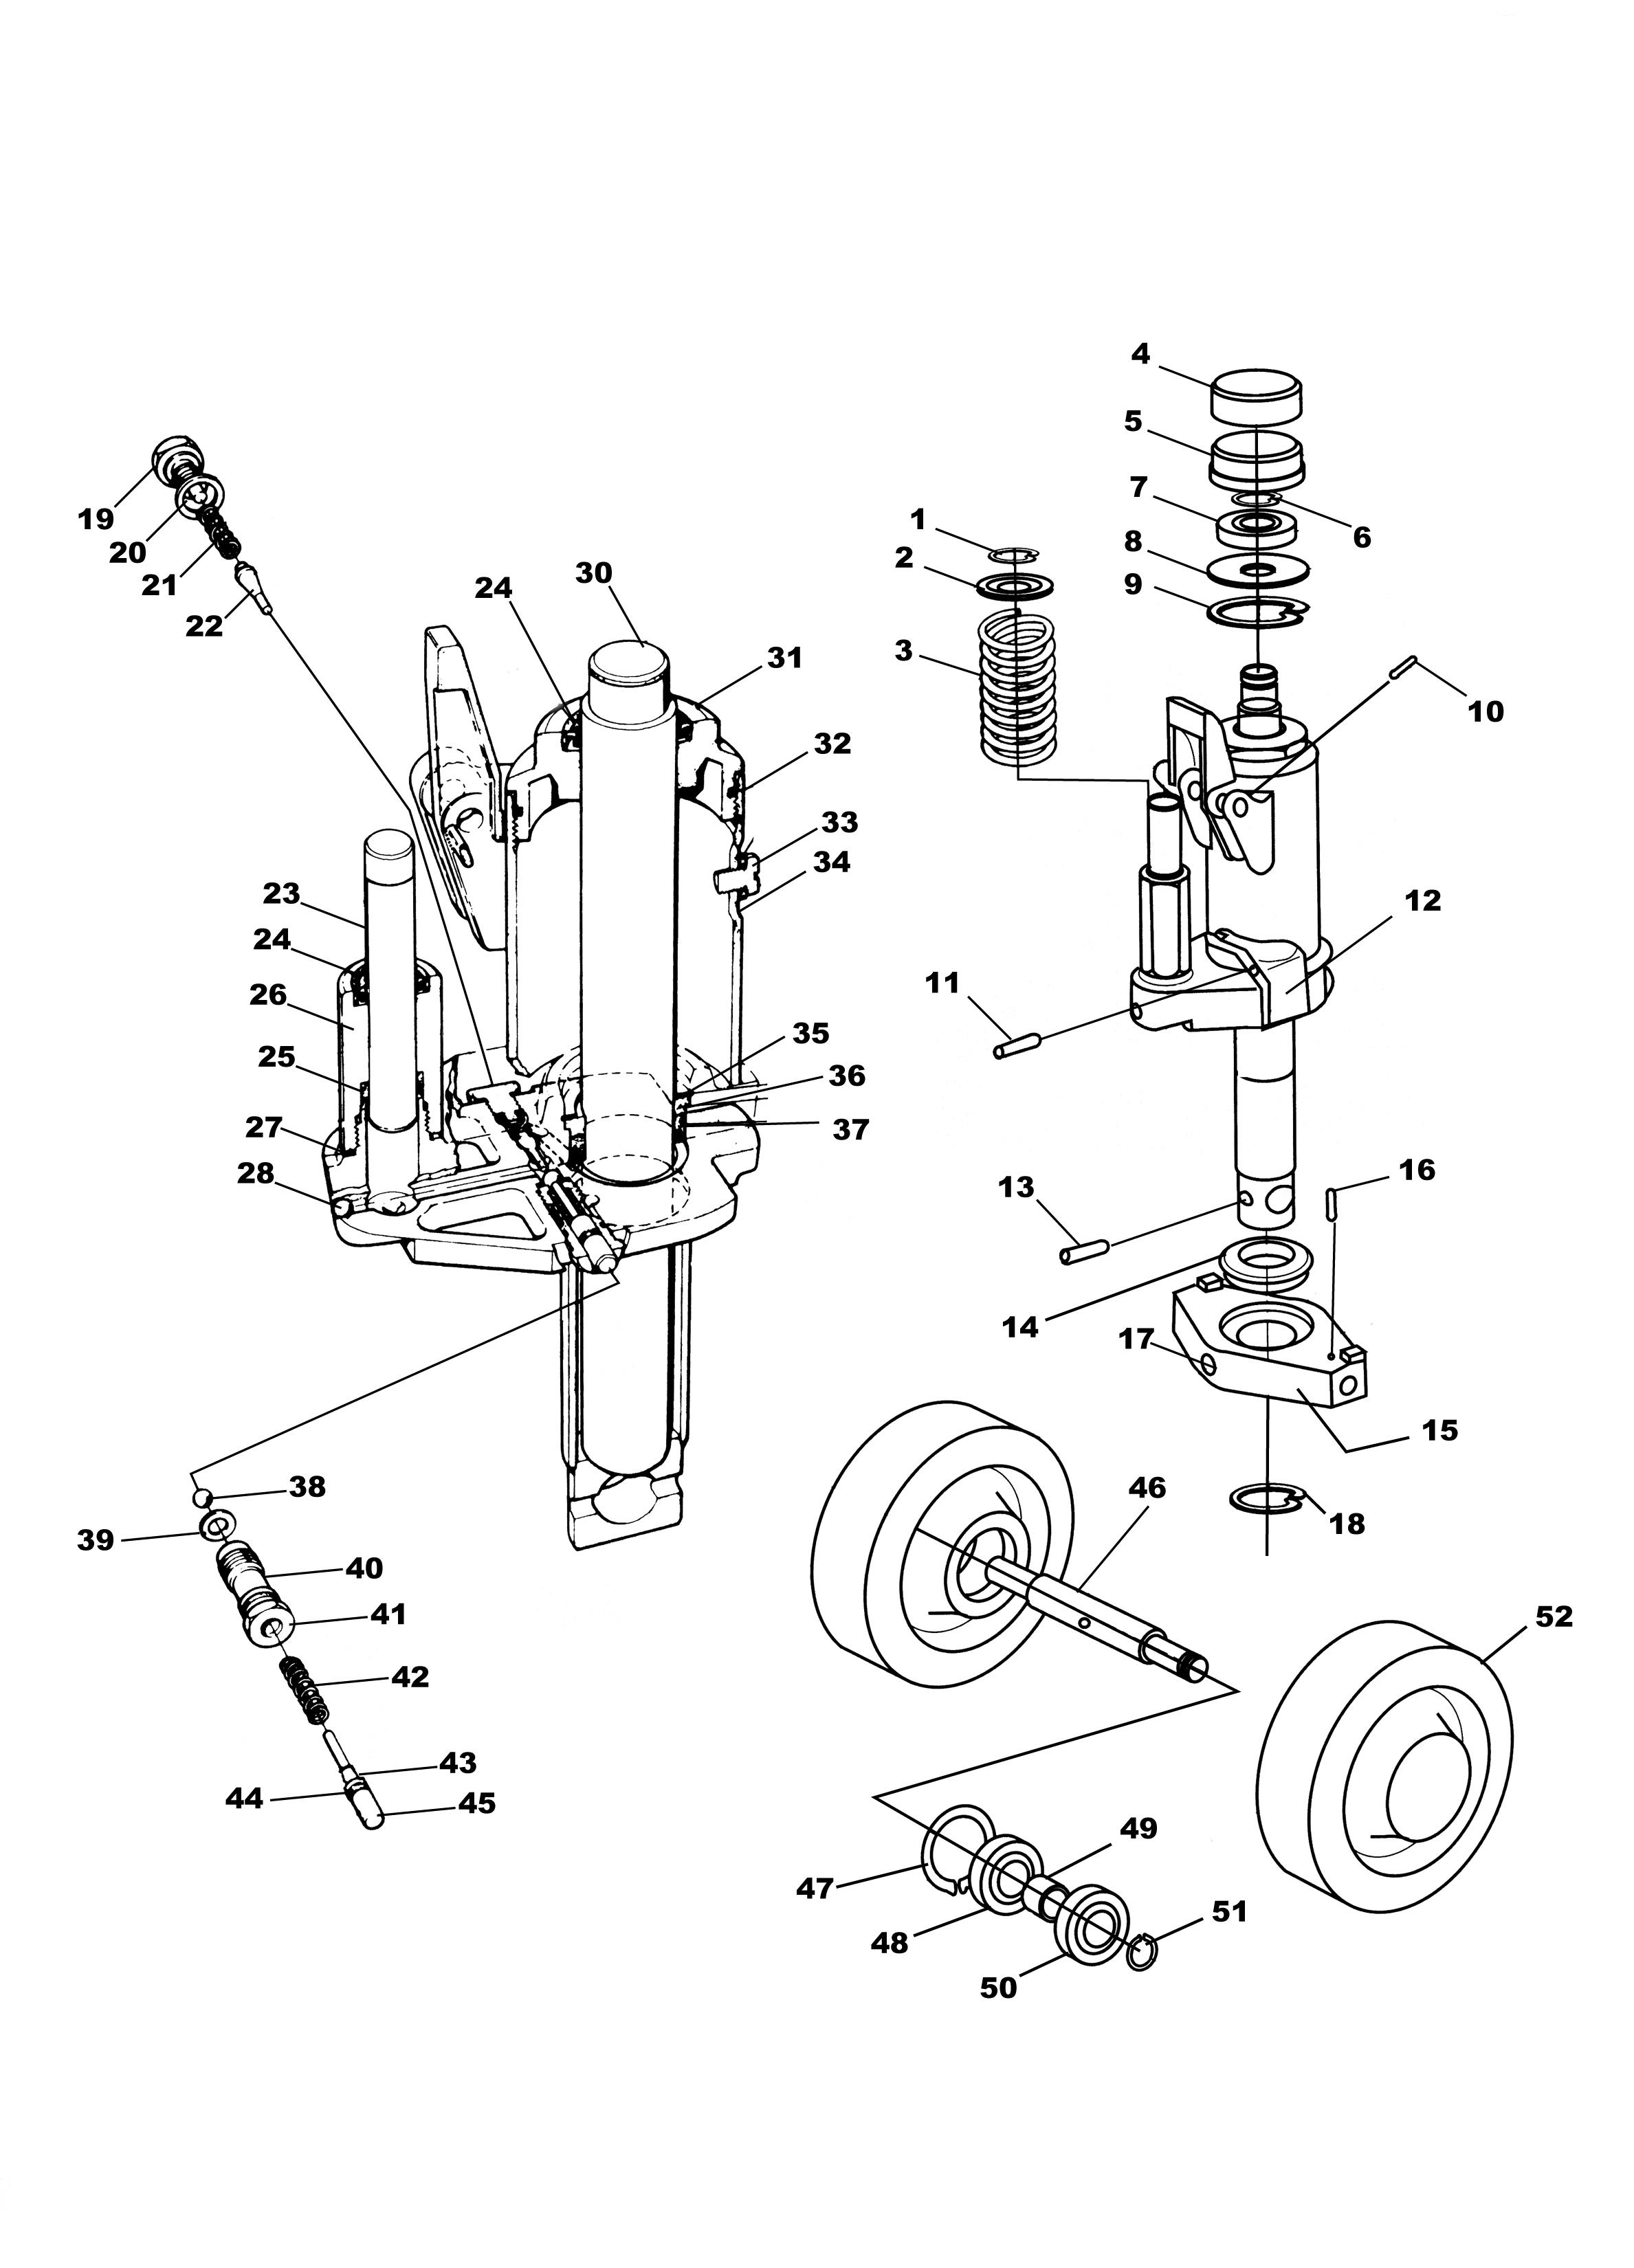 blackhawk floor jack parts diagram nissan pickup radio wiring lincoln free engine image for